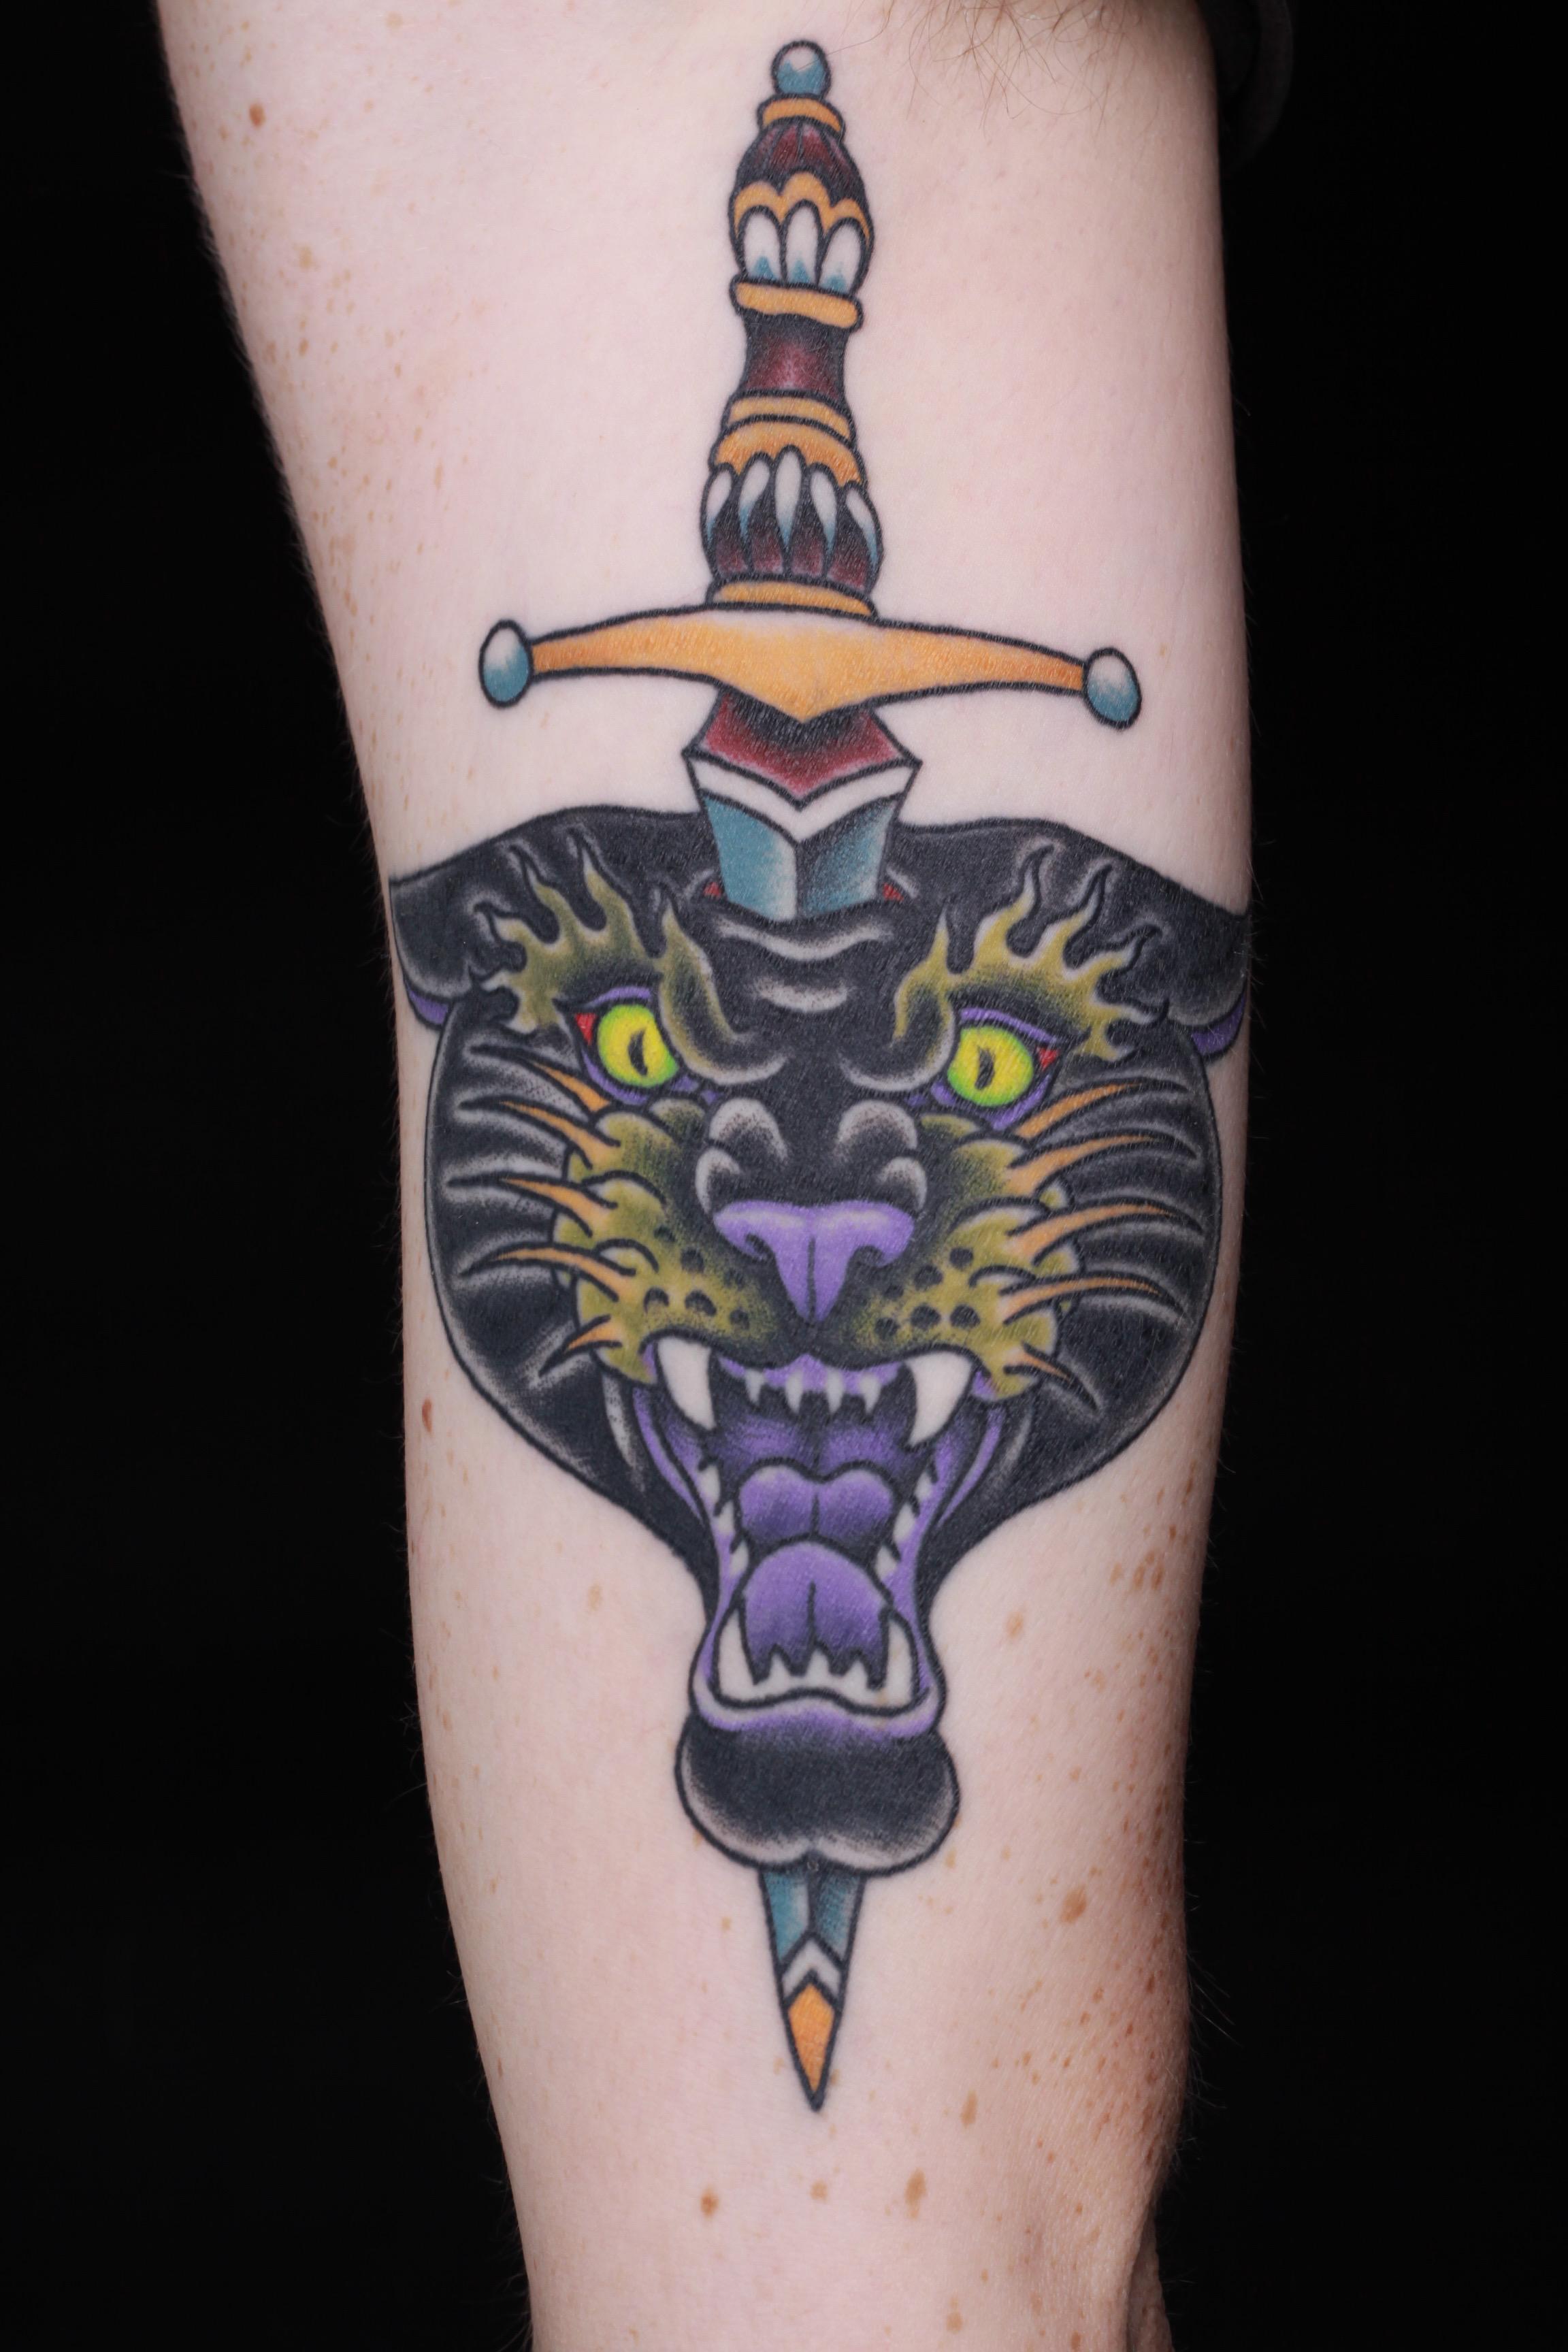 sam-yamini-dedication-tattoo-traditional-panther-dagger-forearm